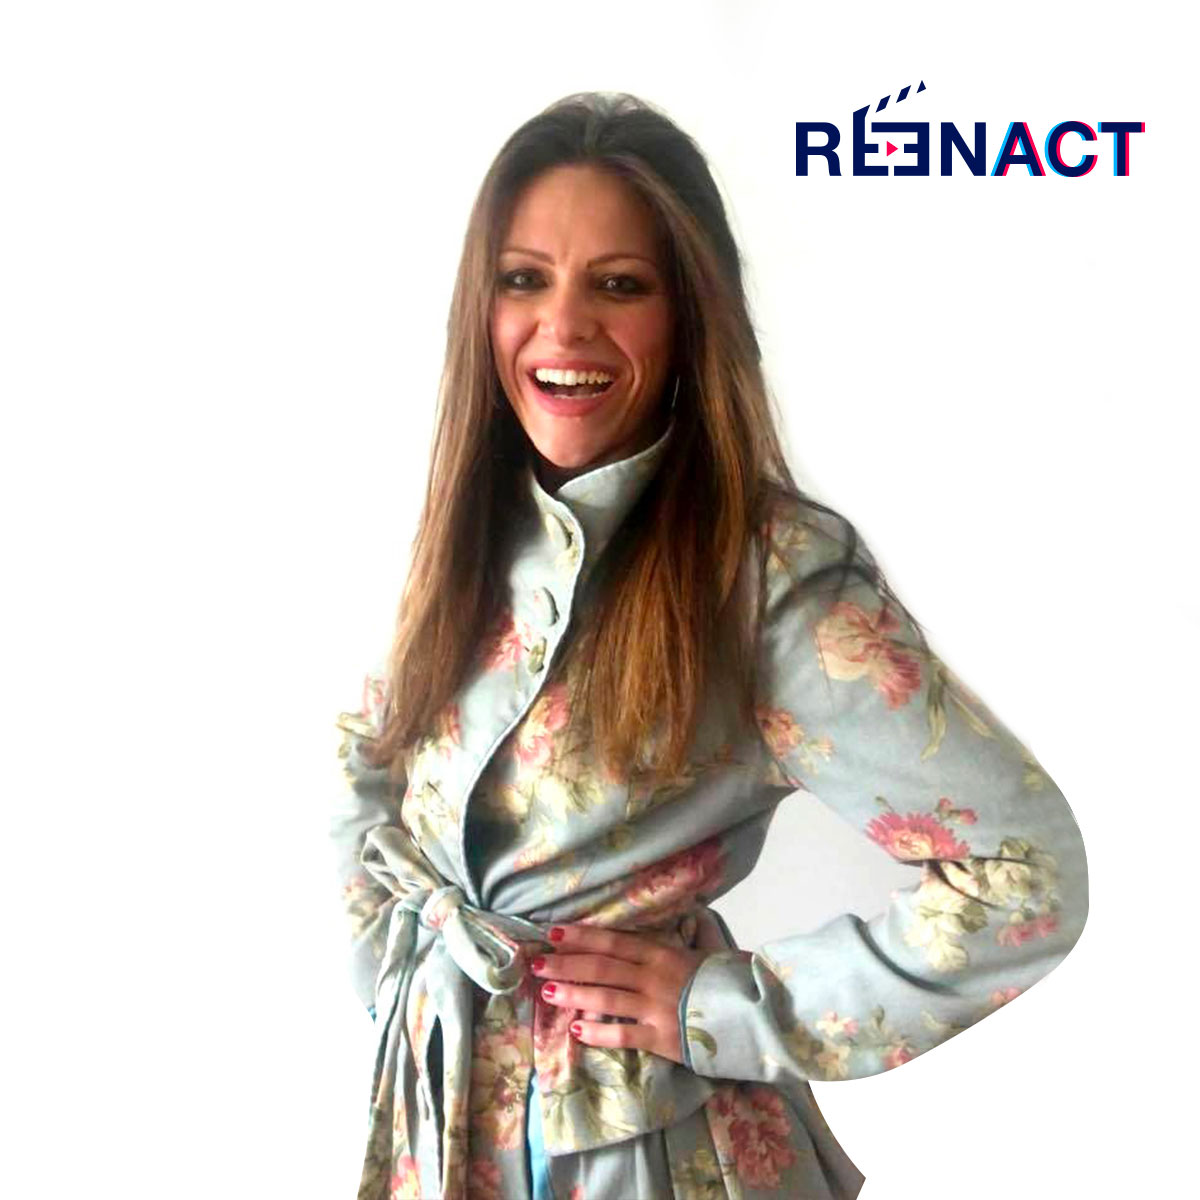 reenact